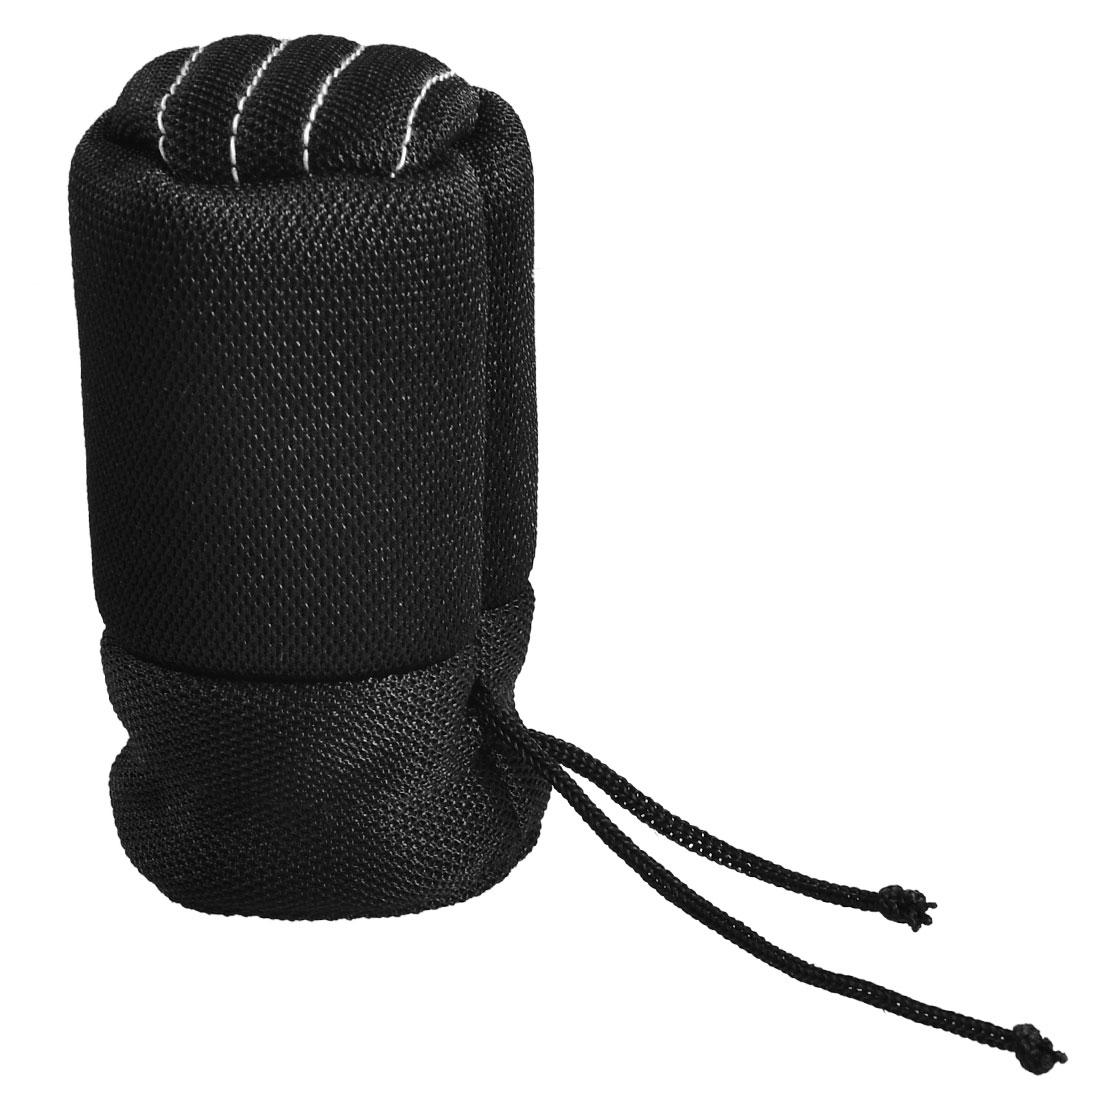 Car Vehicle Black Nylon Drawstring Closure Shift Knob Boot Cover